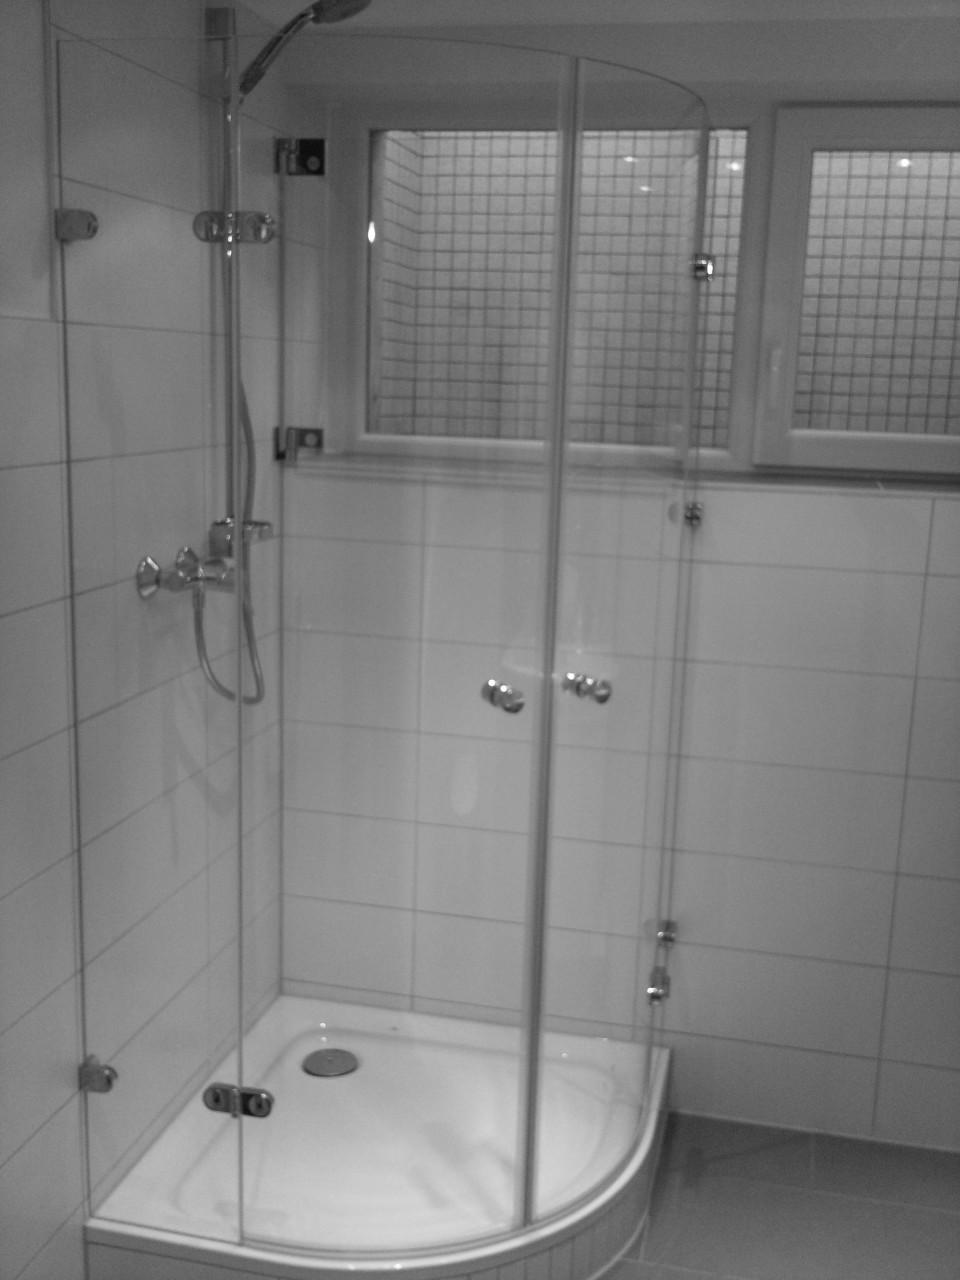 dusche vorm fenster dreh falt dusche dusche vorm fenster. Black Bedroom Furniture Sets. Home Design Ideas